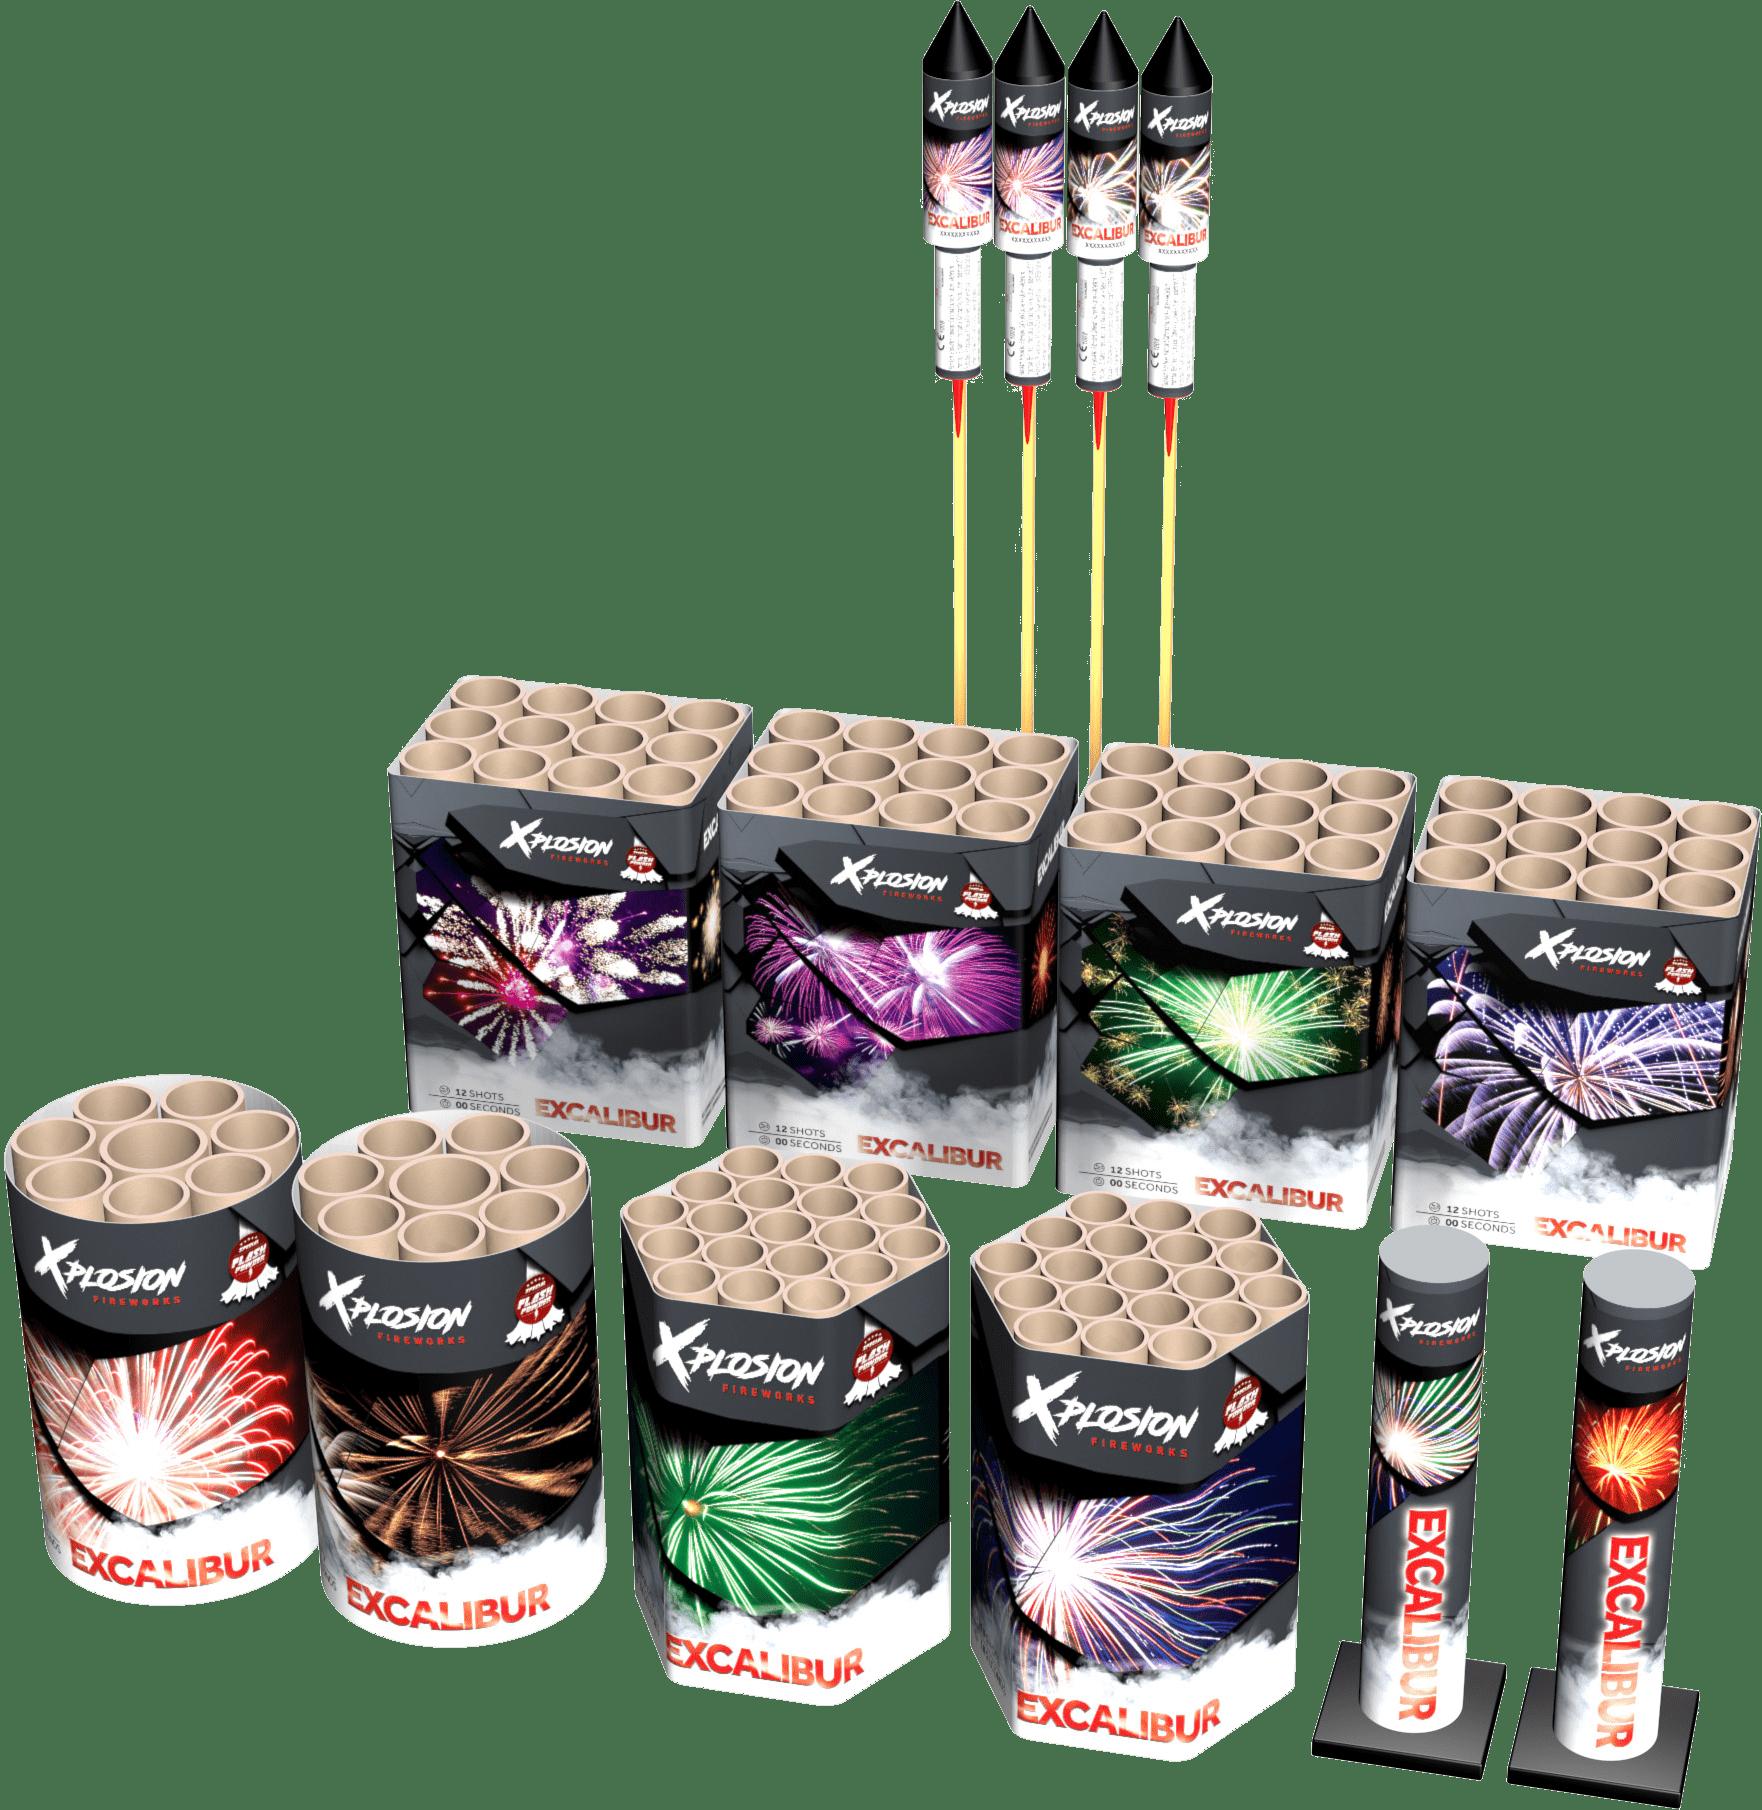 Excalibur pakket